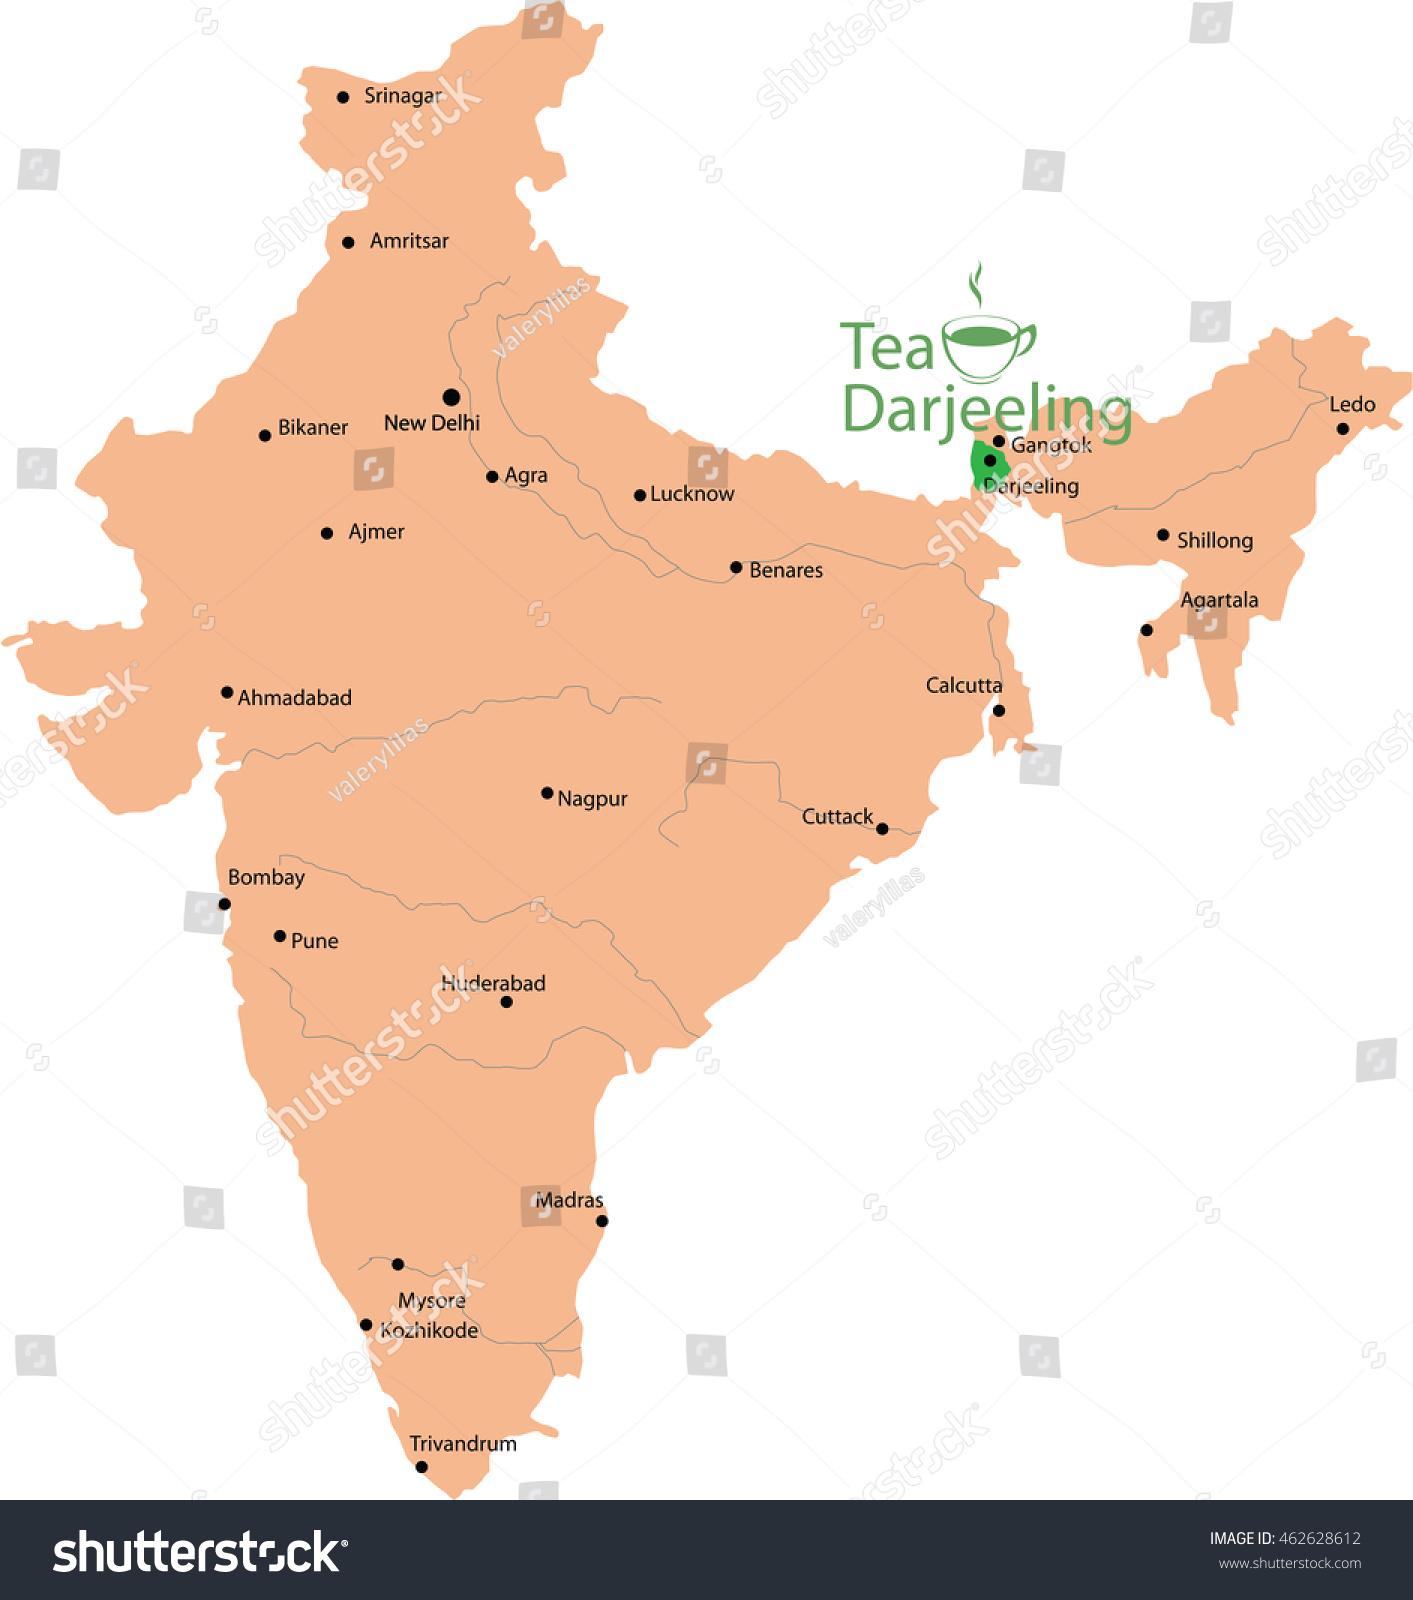 Darjeeling In India Map Tea Map Darjeeling India Stock Vector (Royalty Free) 462628612